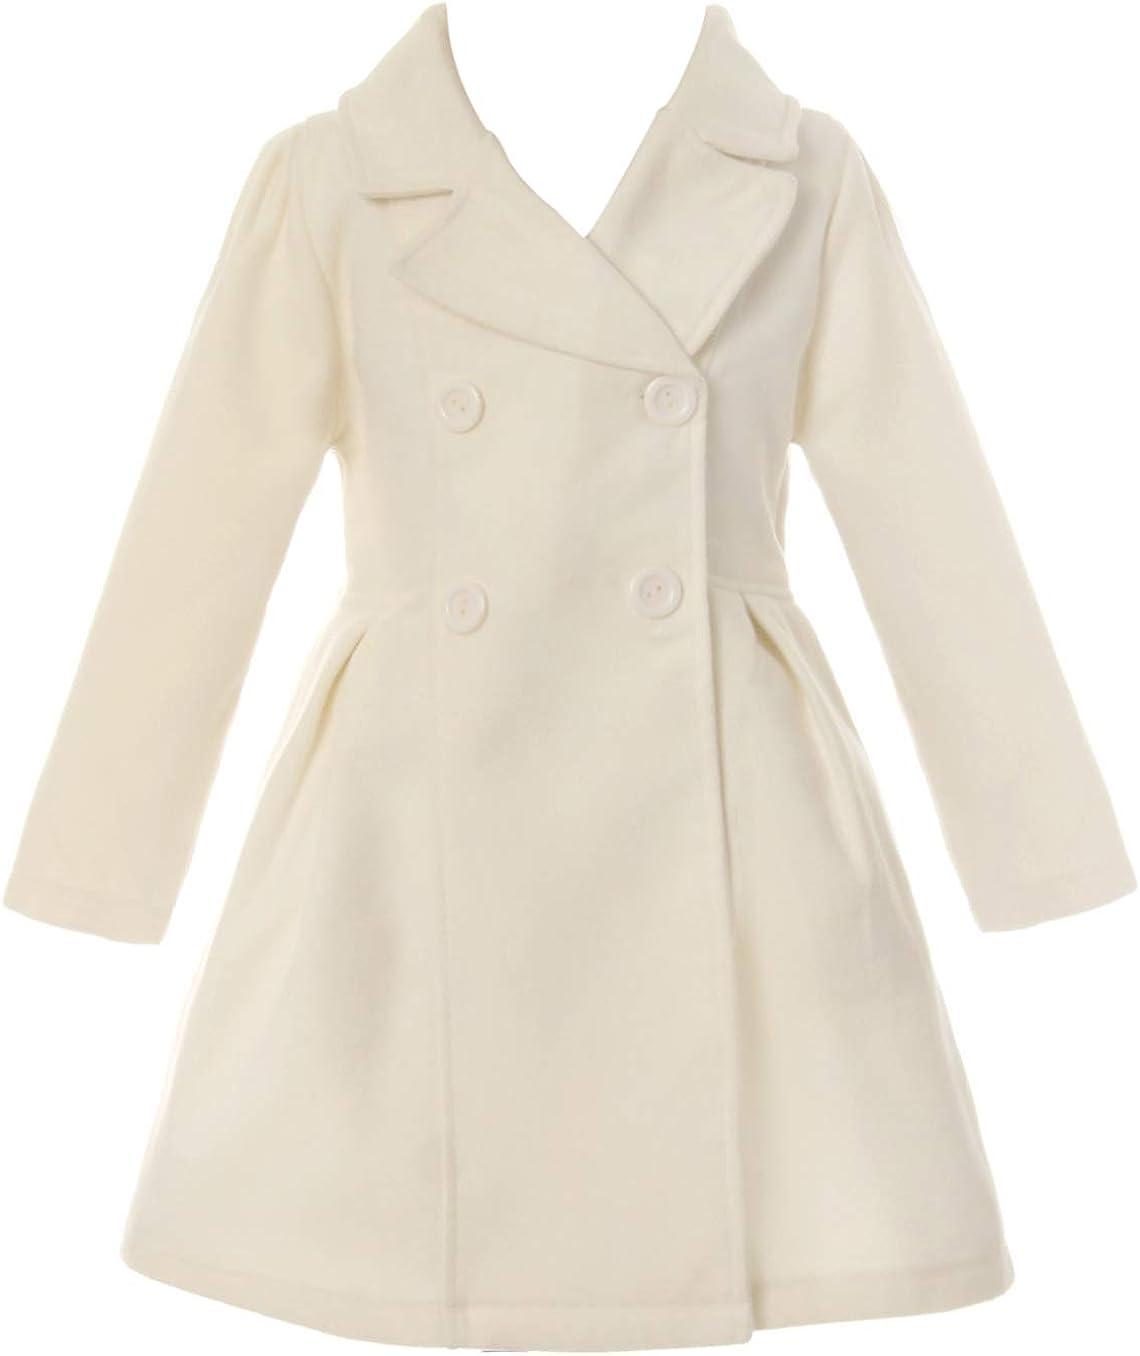 Girl Winter Dress Coat Long Sleeve Buttons and Pockets Flower Girl Jacket